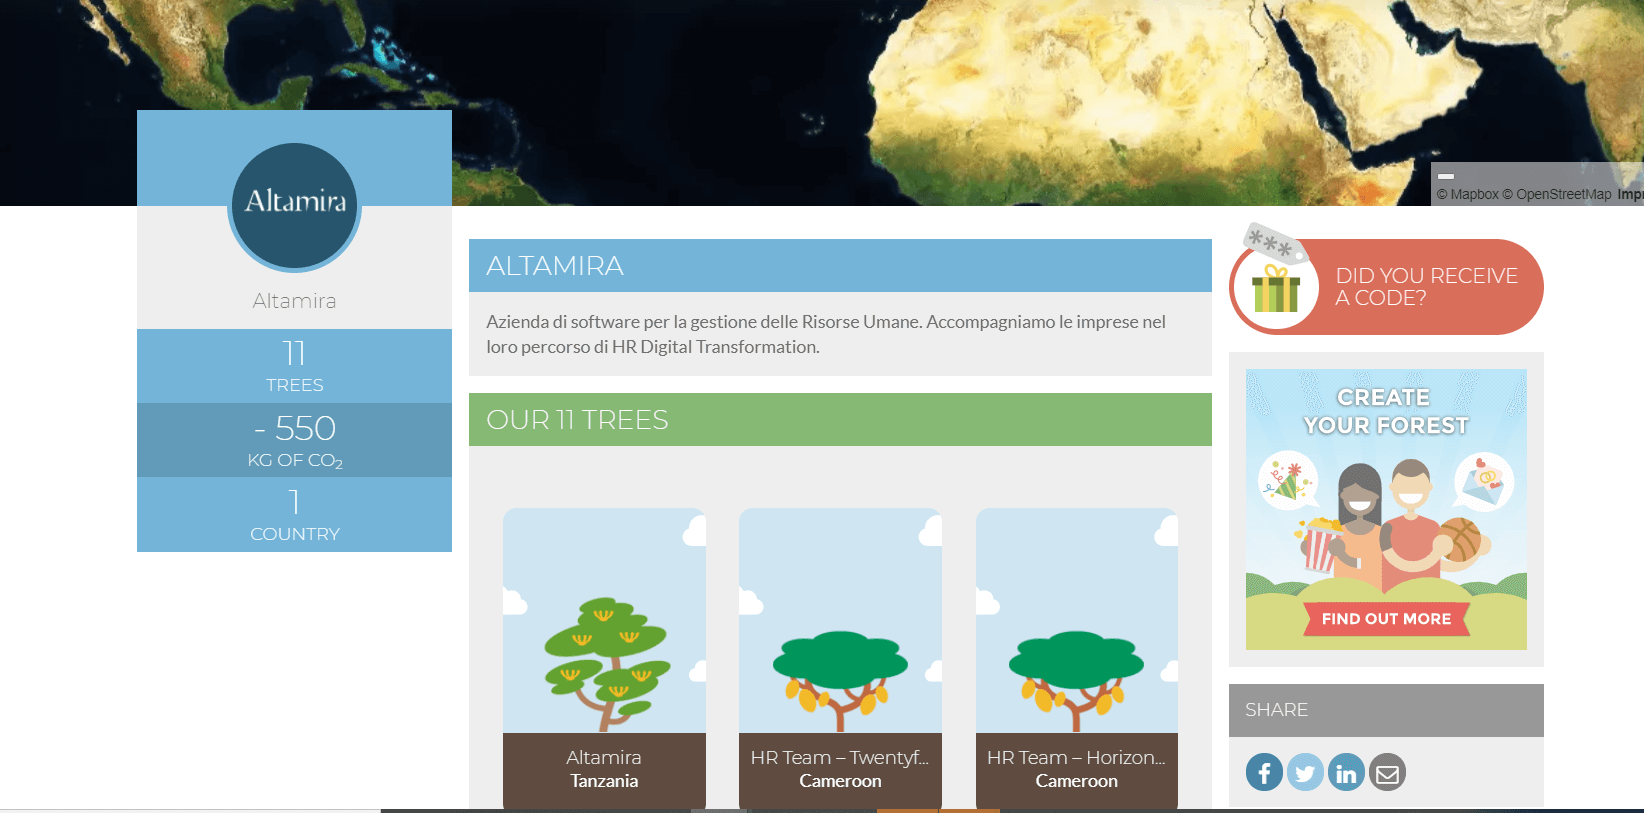 Treedom Altamira page